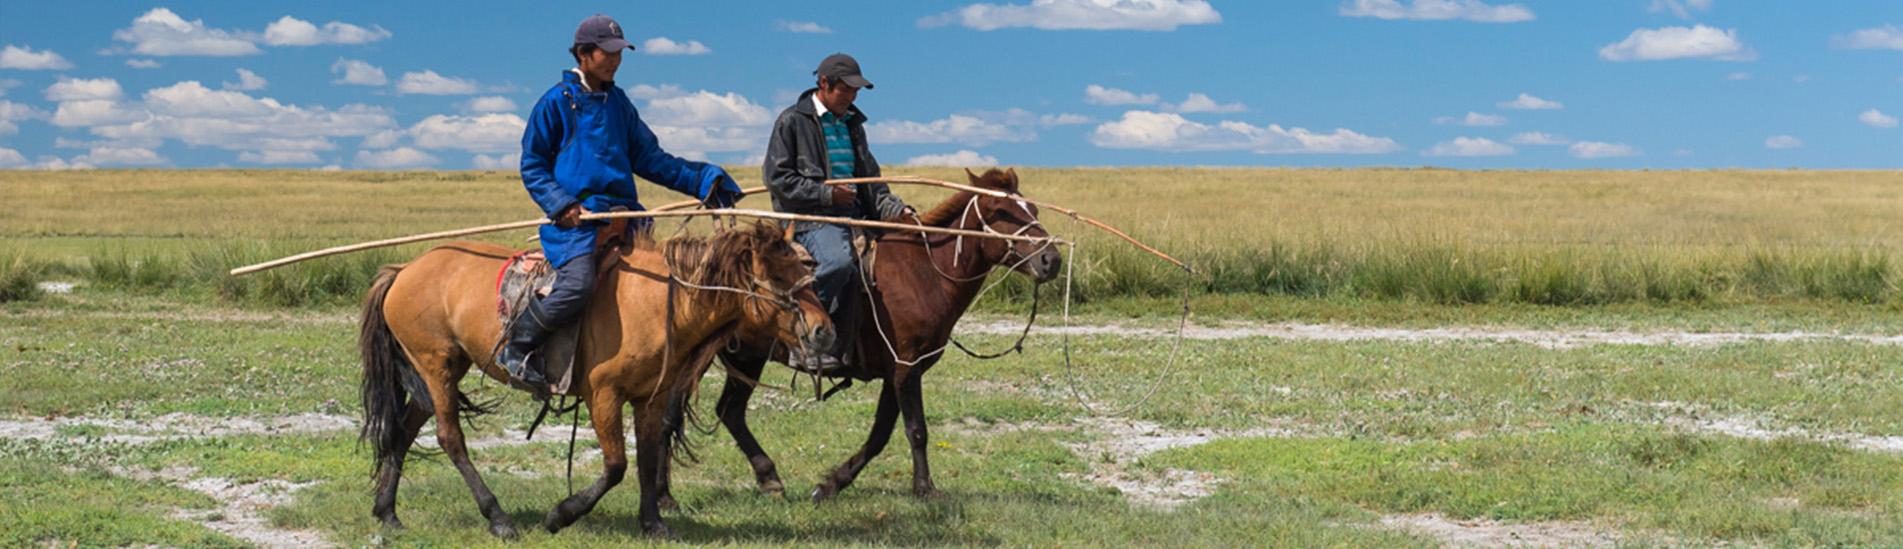 Population & Language of Mongolia